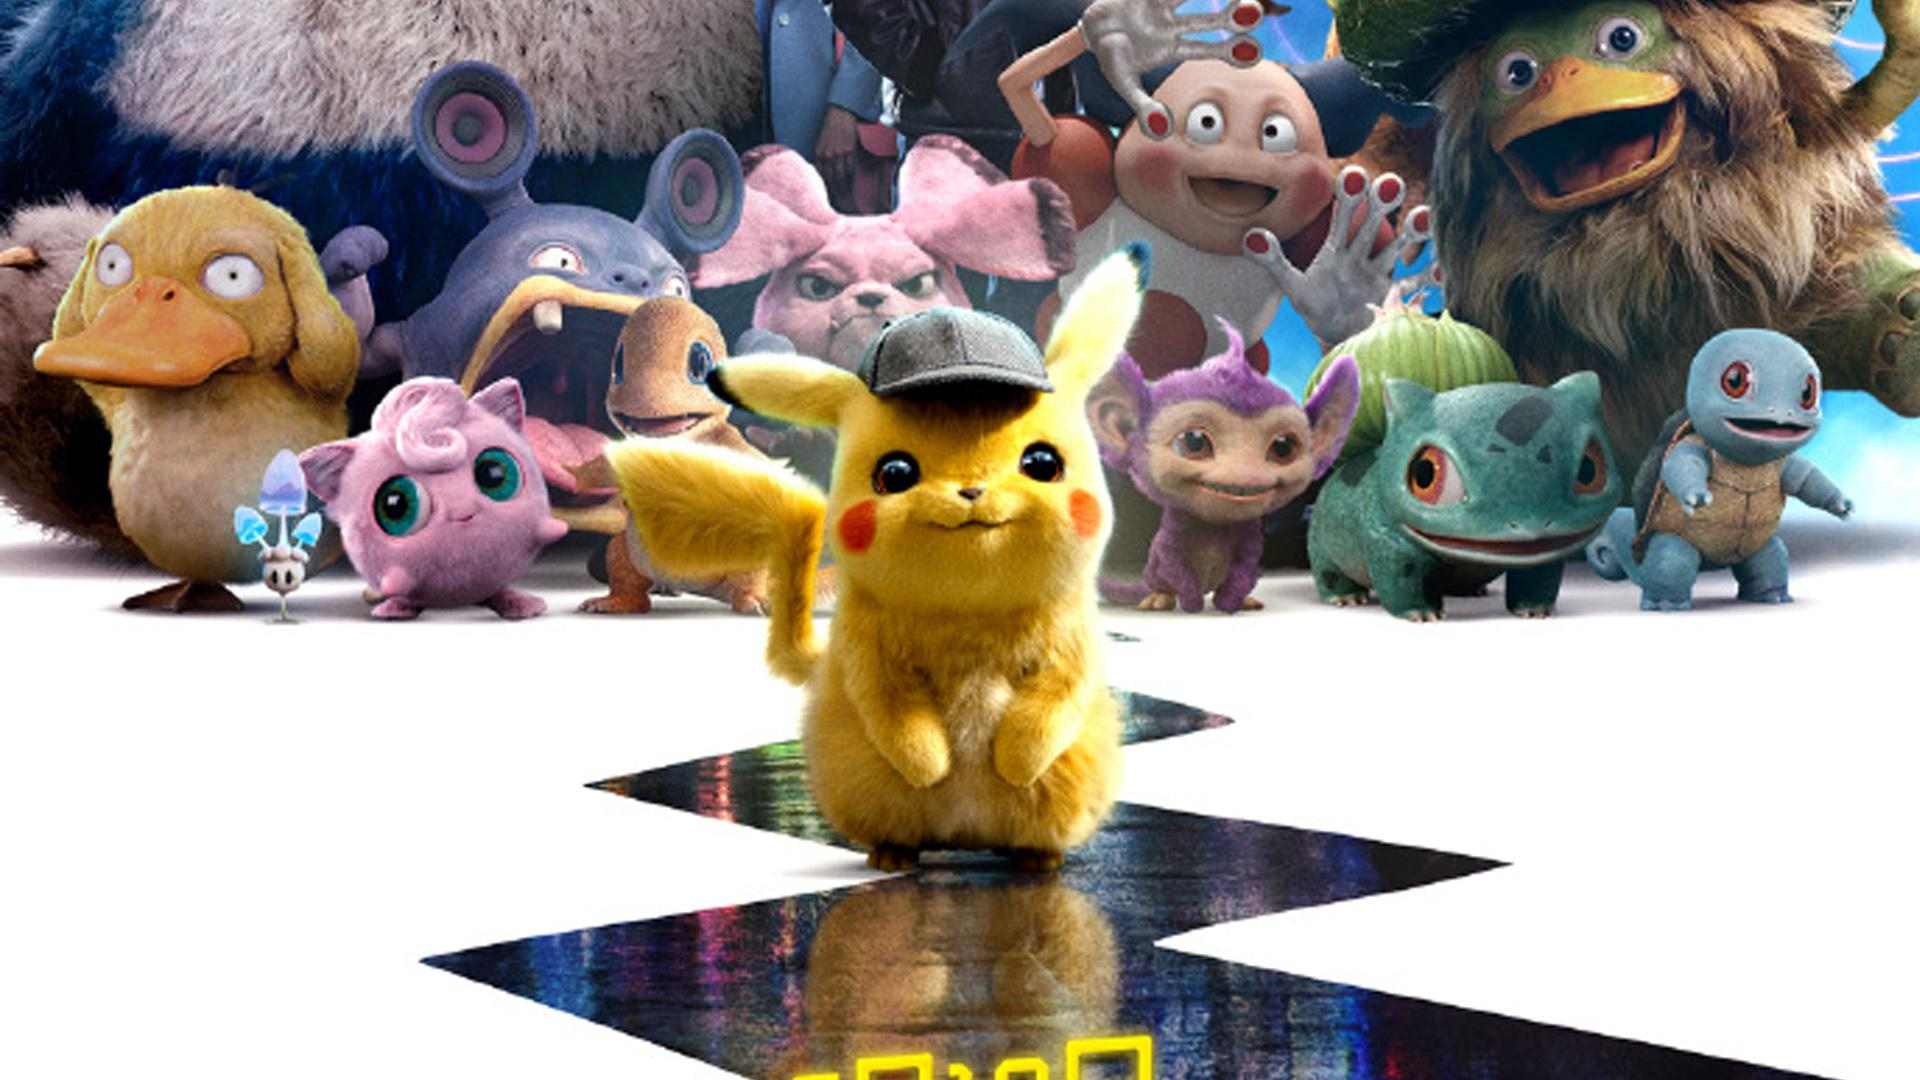 Pokémon Detective Pikachu Hd Wallpapers Wallpaper Cave